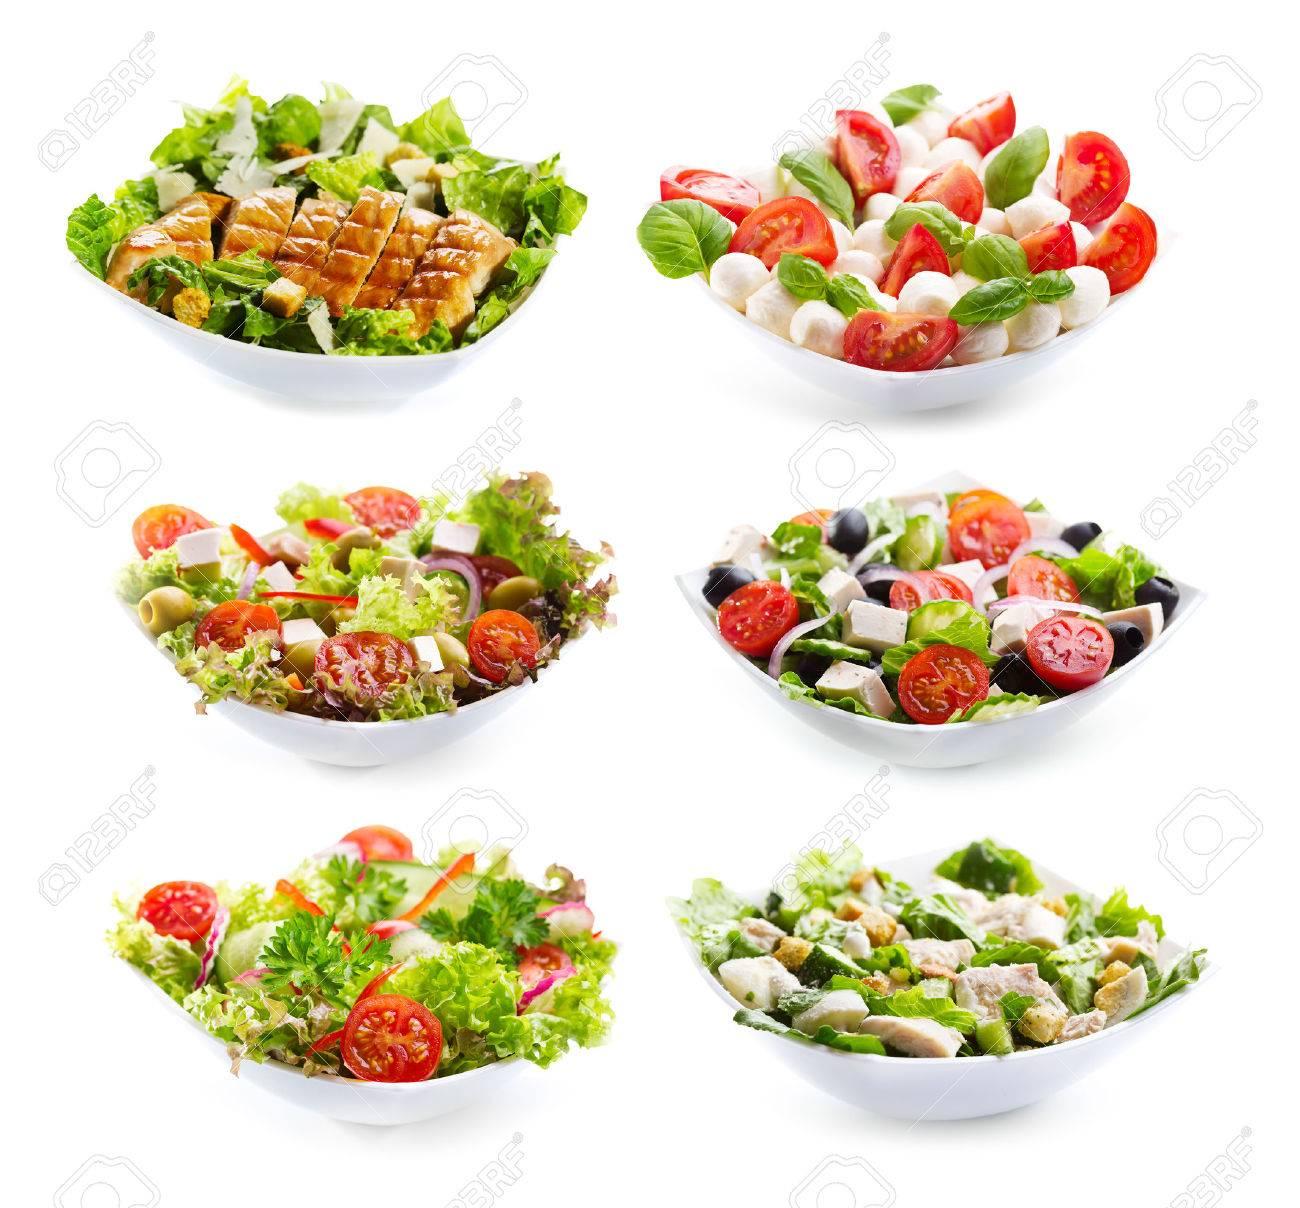 set of varioust salads on white background - 29200537